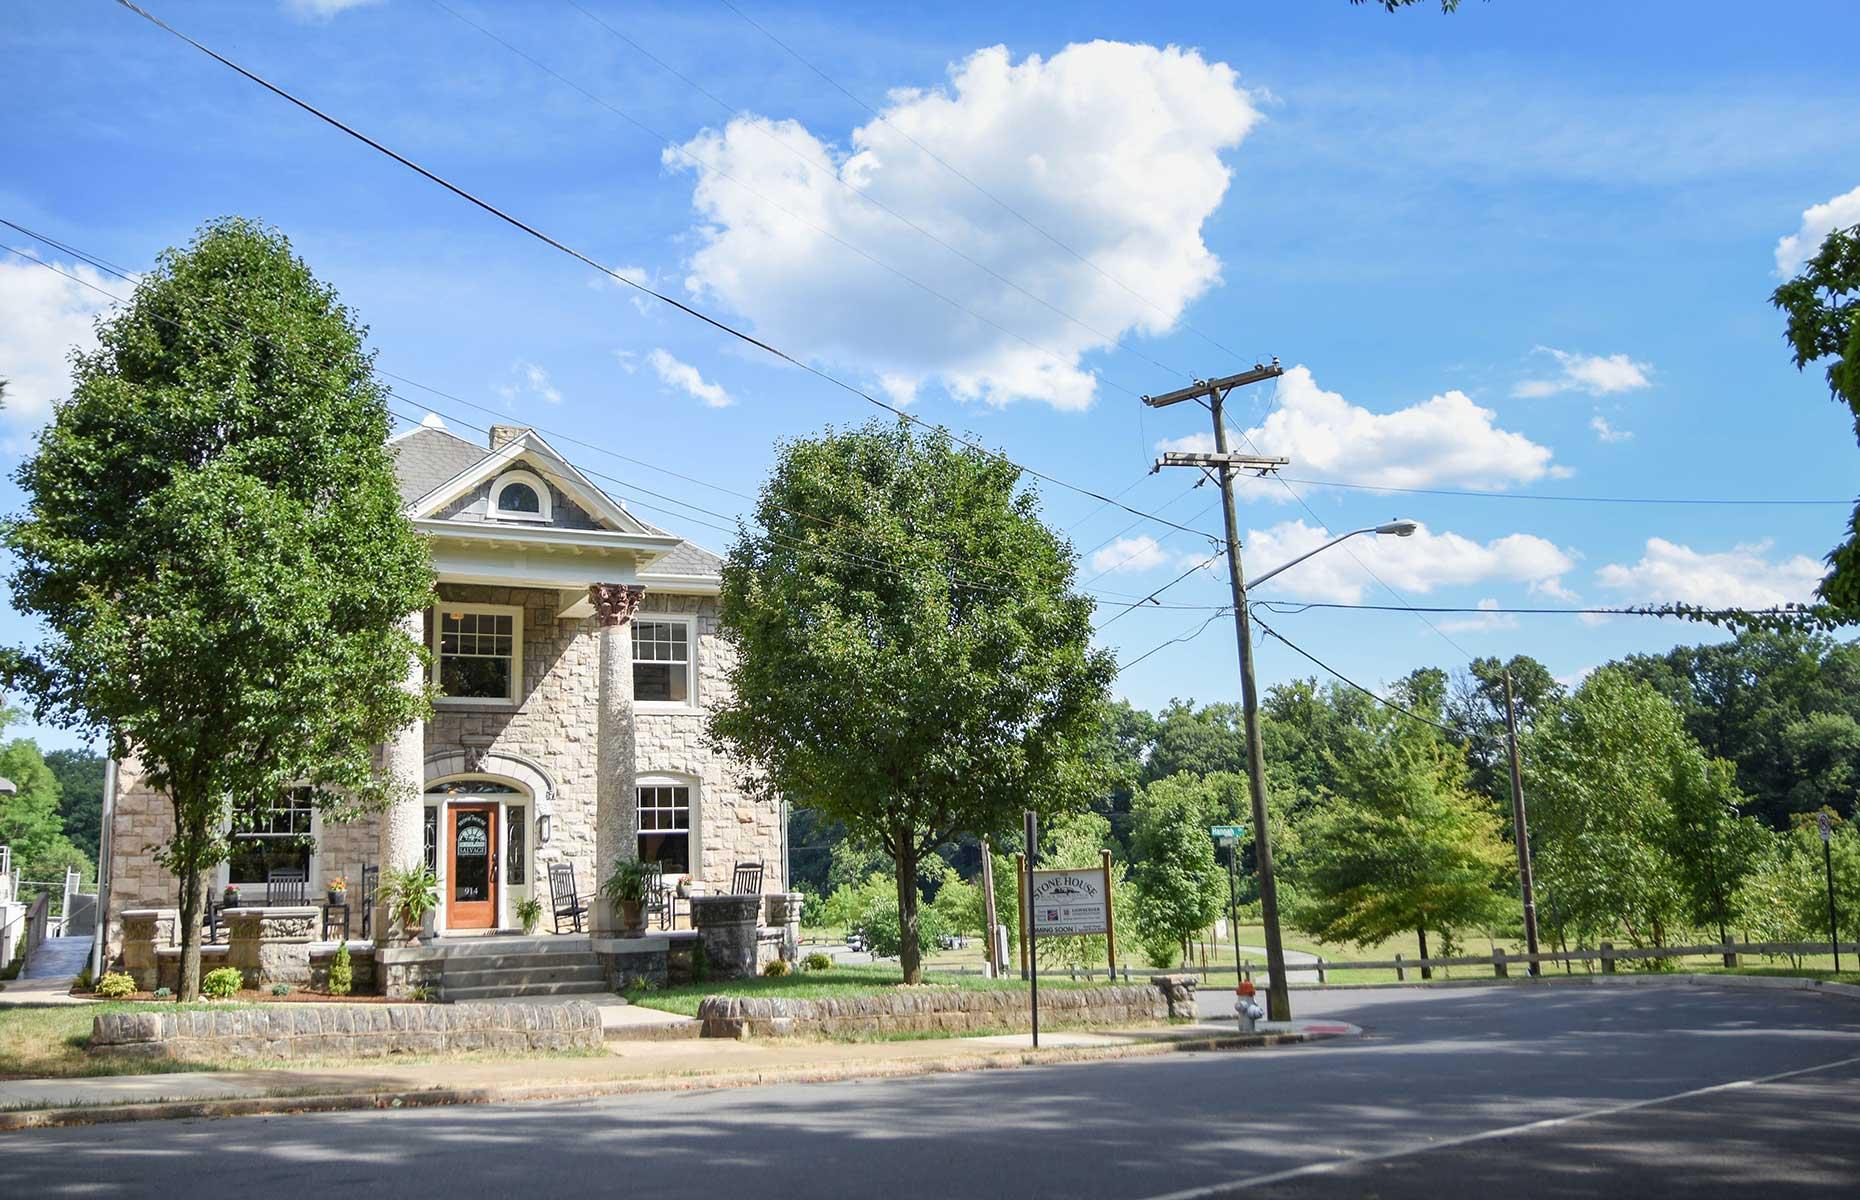 The Stone House, Roanoke Virginia